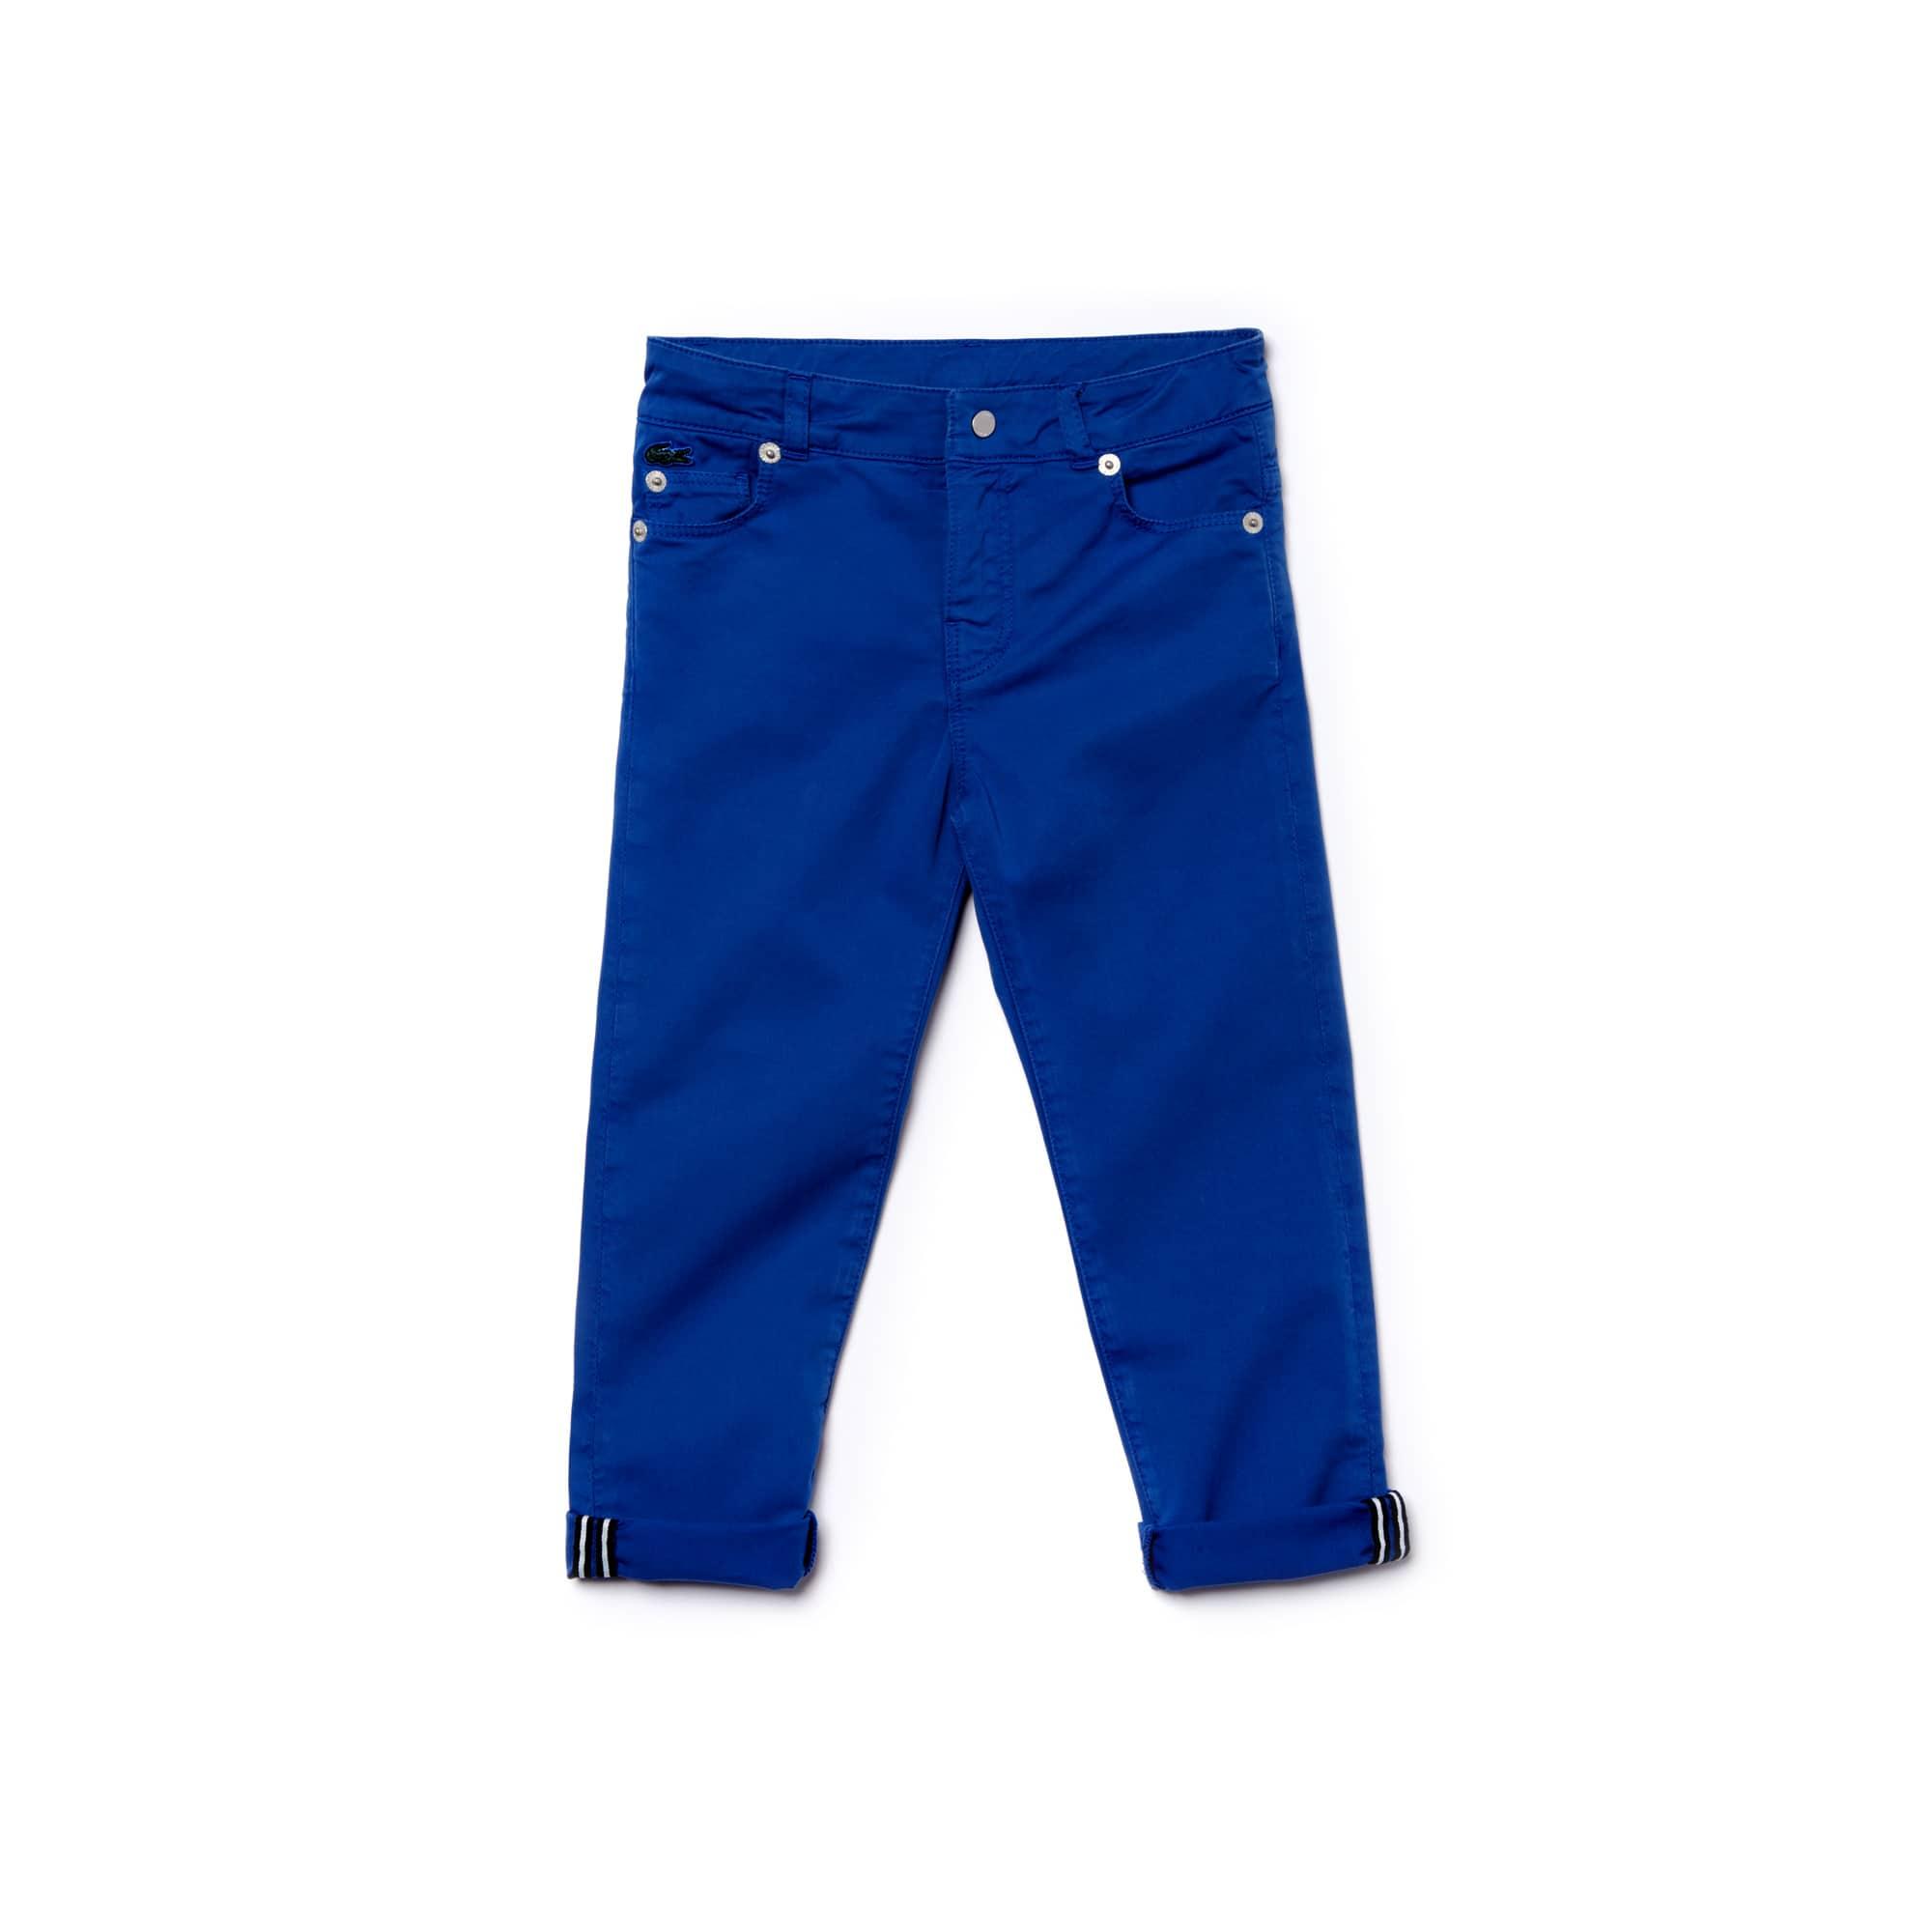 Pantaloni Bambino 5 tasche in gabardine stretch tinta unita